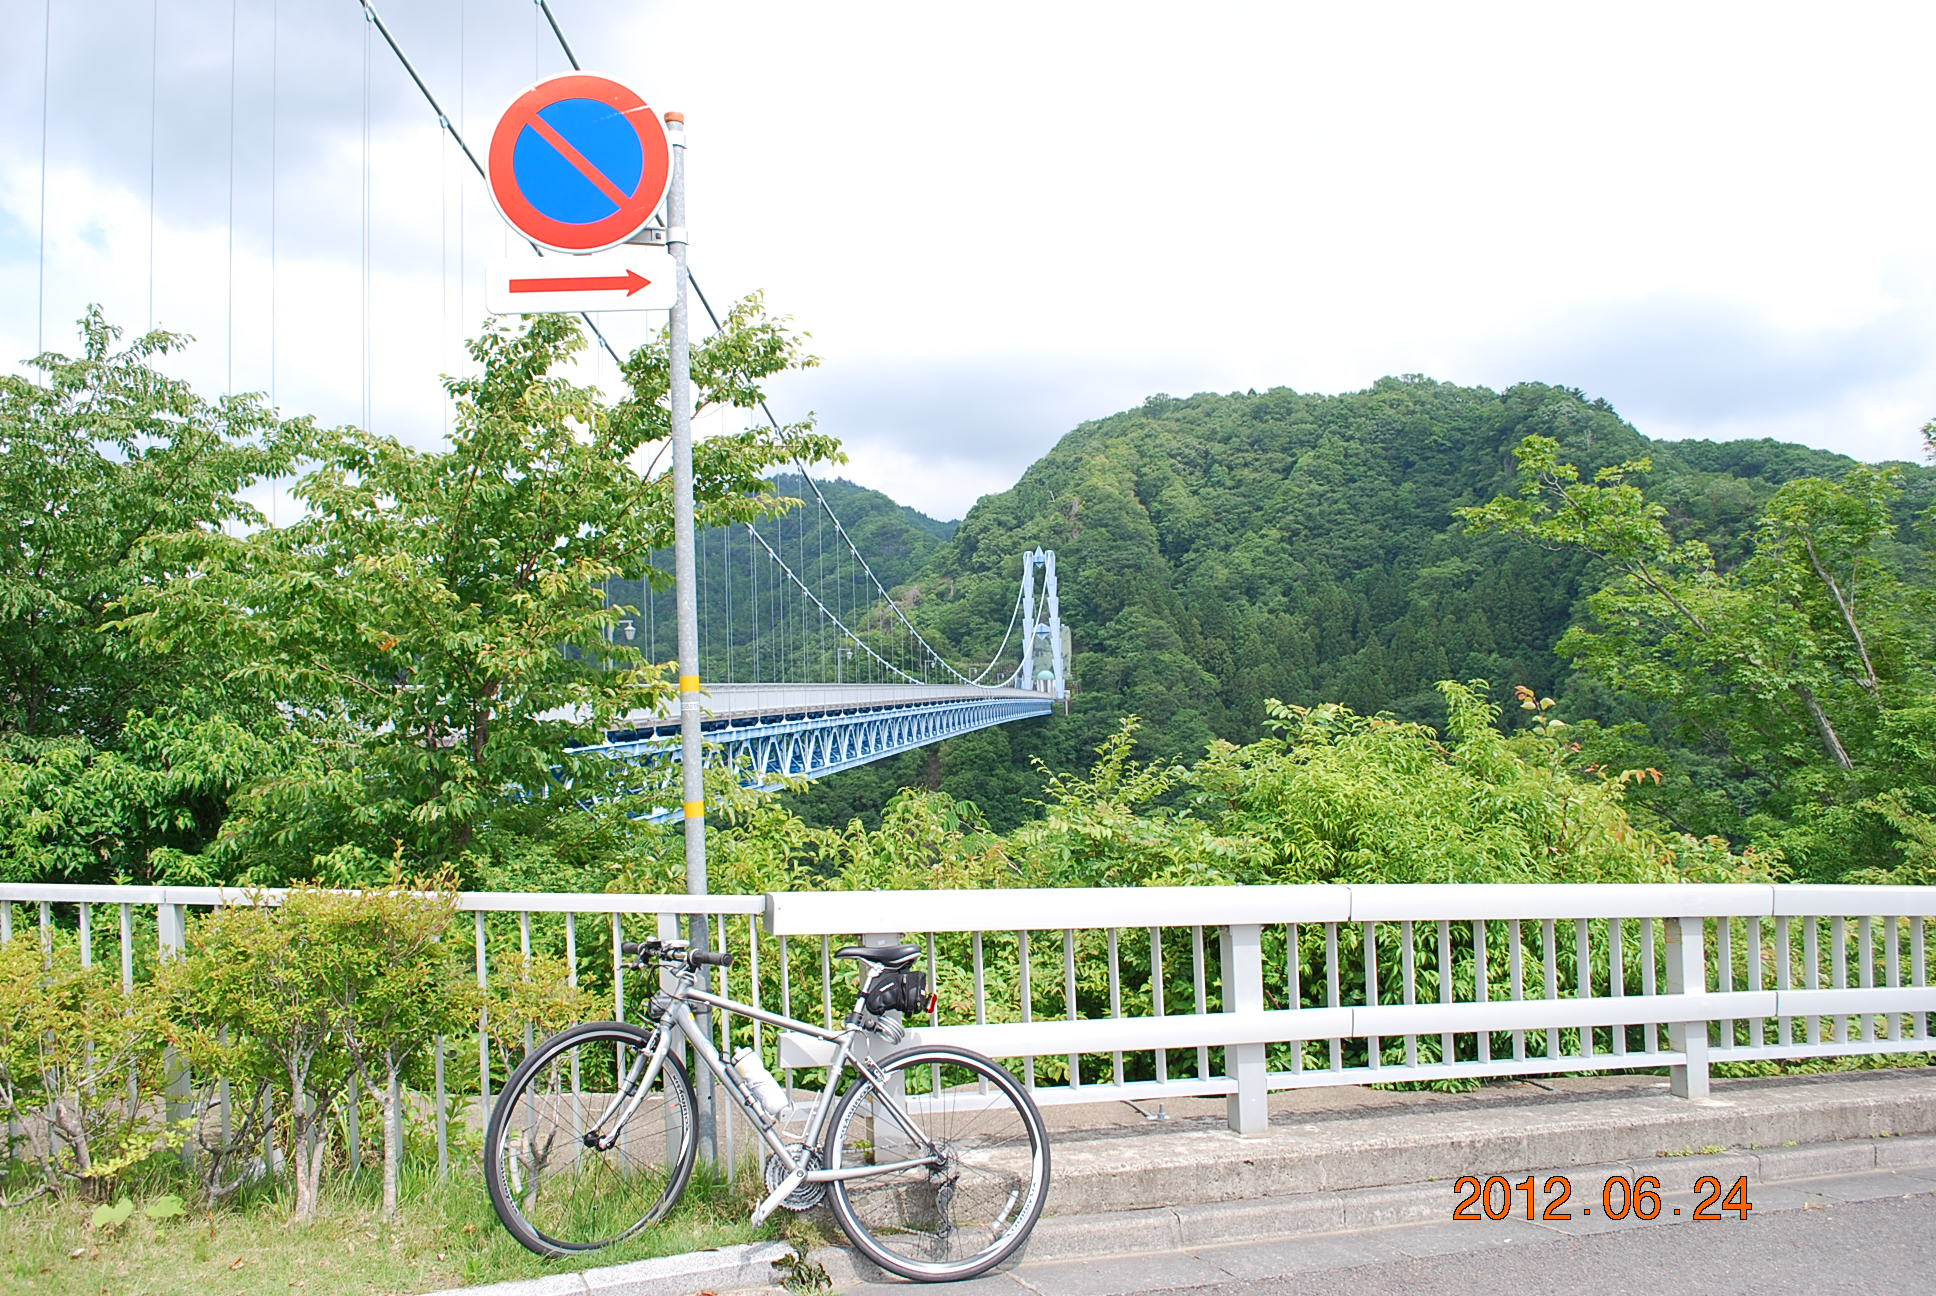 2012_0624_094514-DSC_0443.jpg